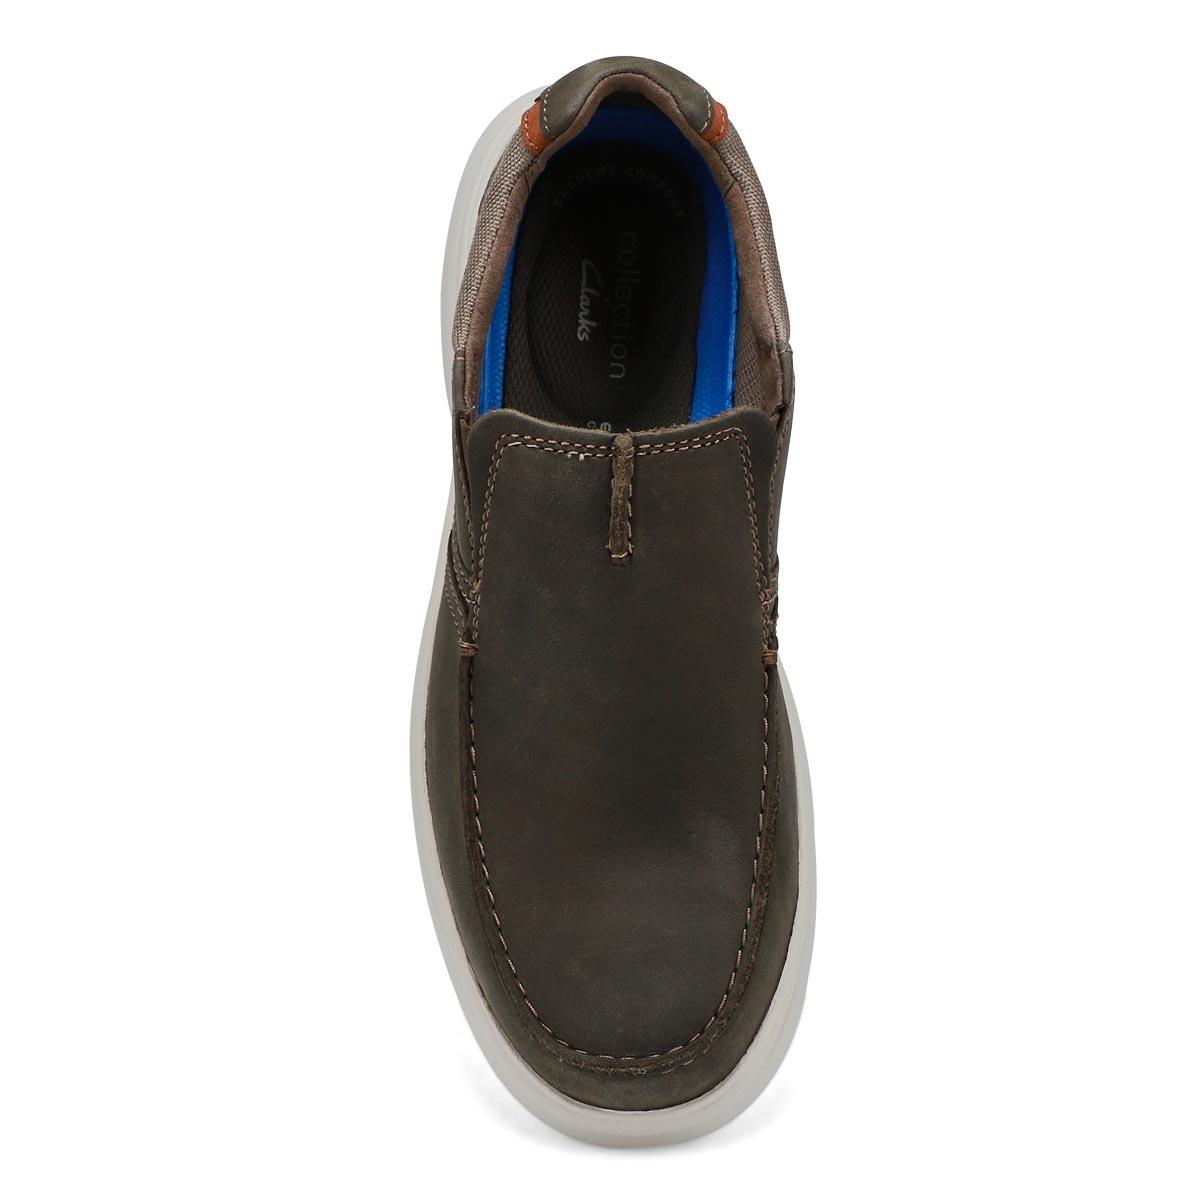 Men's Bradley Free Casual Wide Loafer - Olive